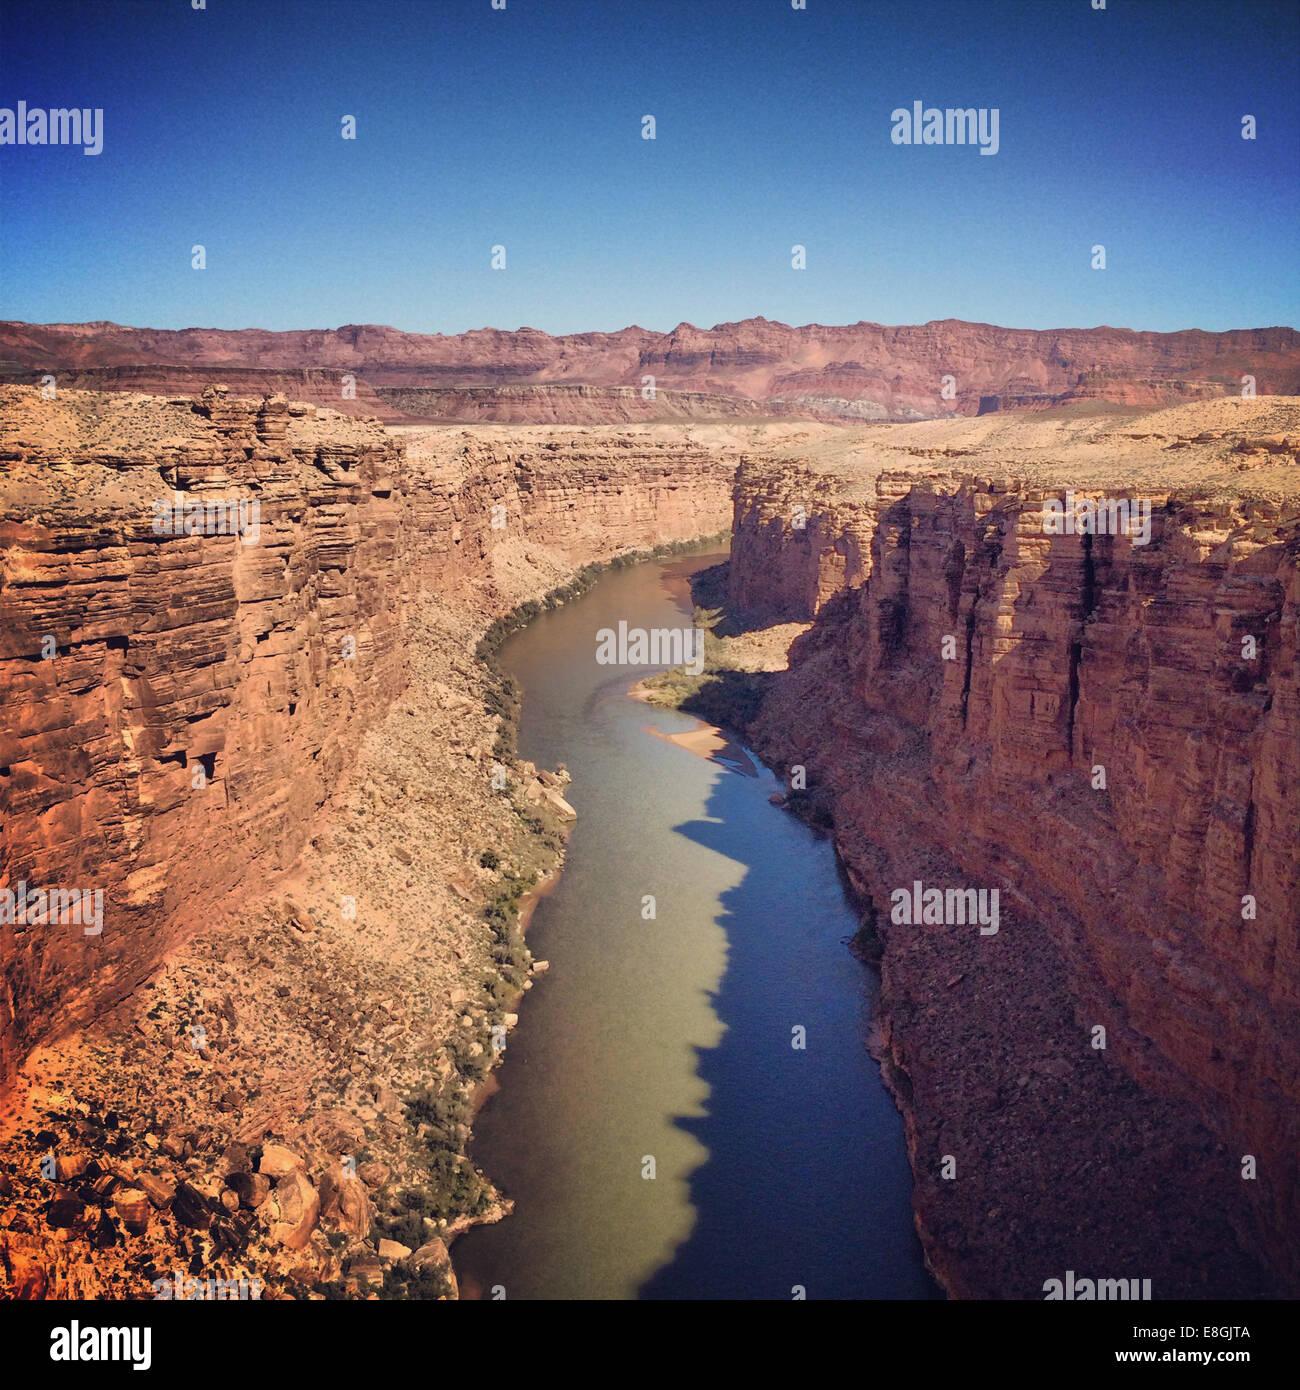 View of Colorado river from Navajo Bridge, Arizona, America, USA - Stock Image